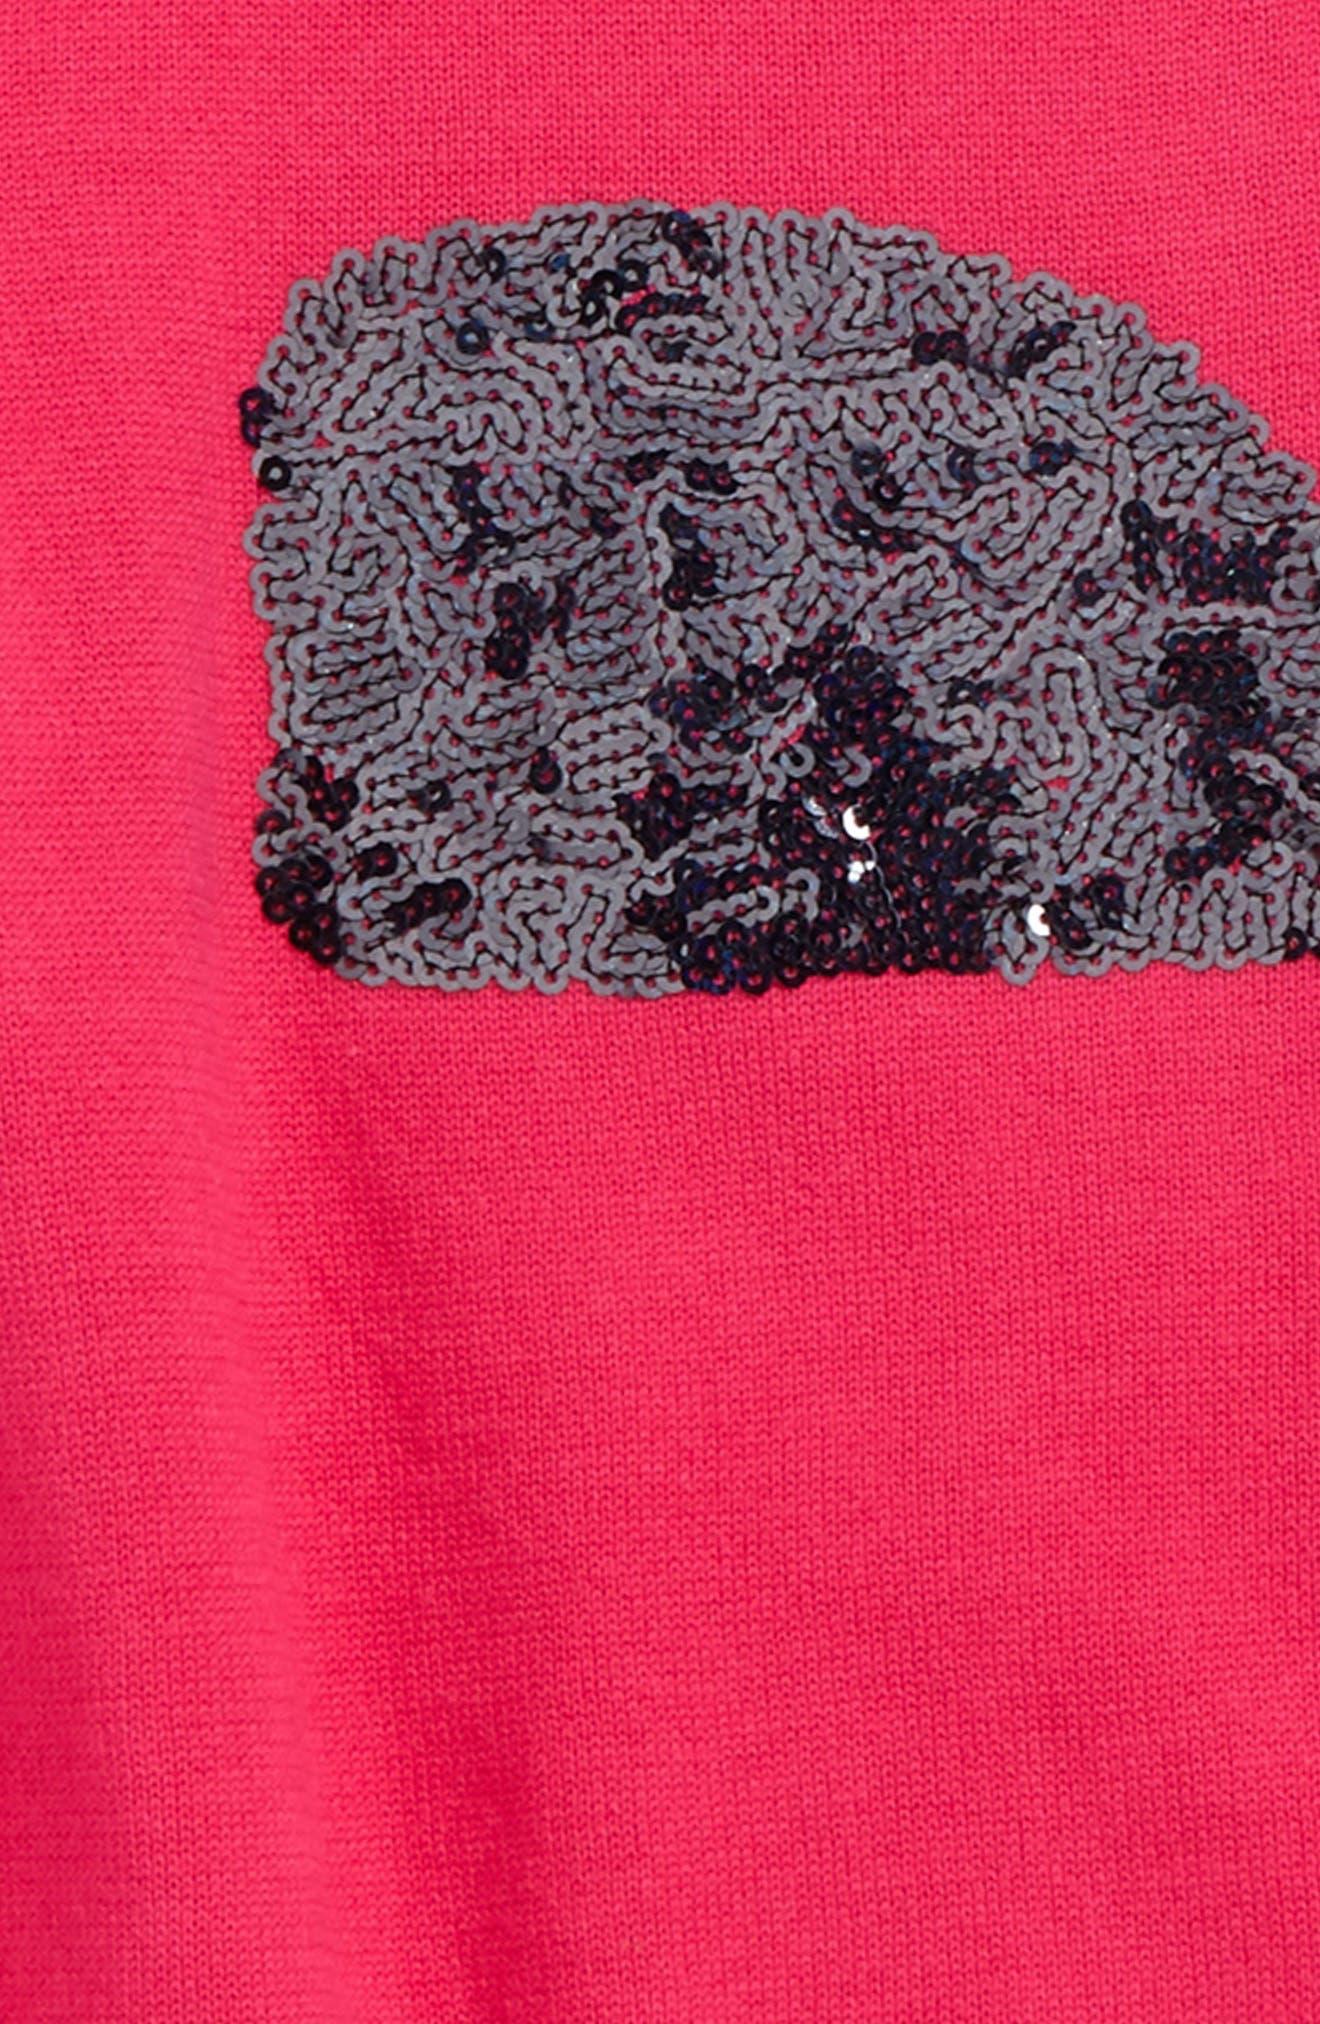 VINEYARD VINES,                             Sequin Whale Sweater,                             Alternate thumbnail 2, color,                             658